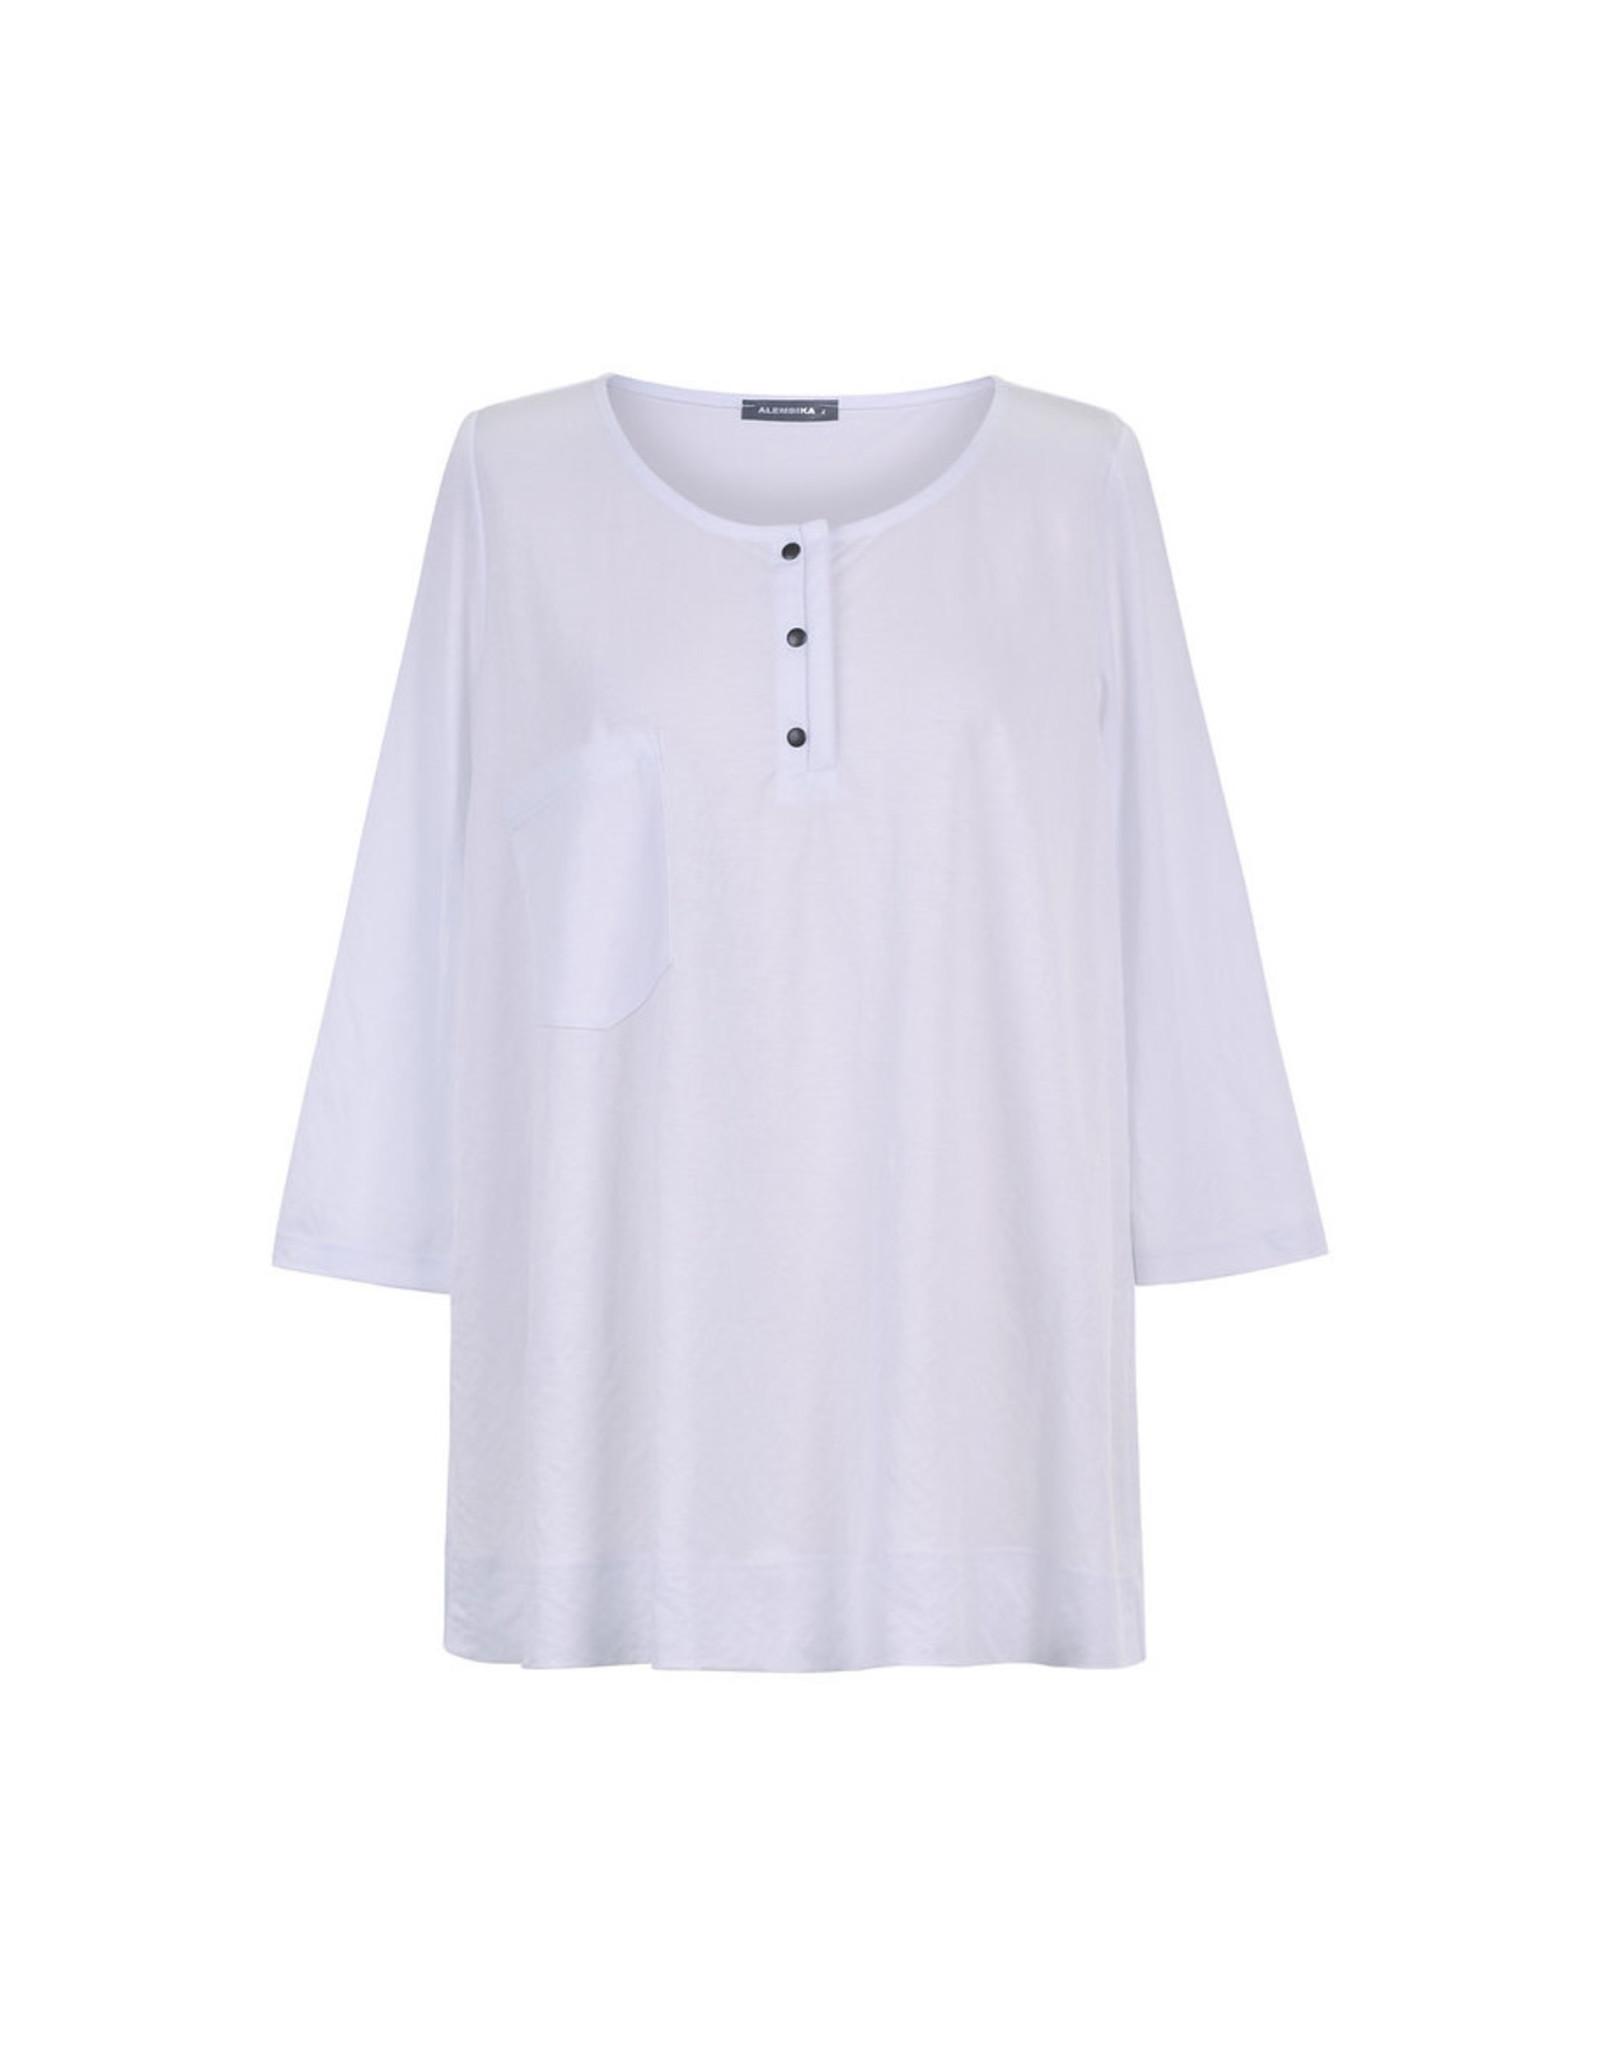 Alembika Alembika Knit Top-White